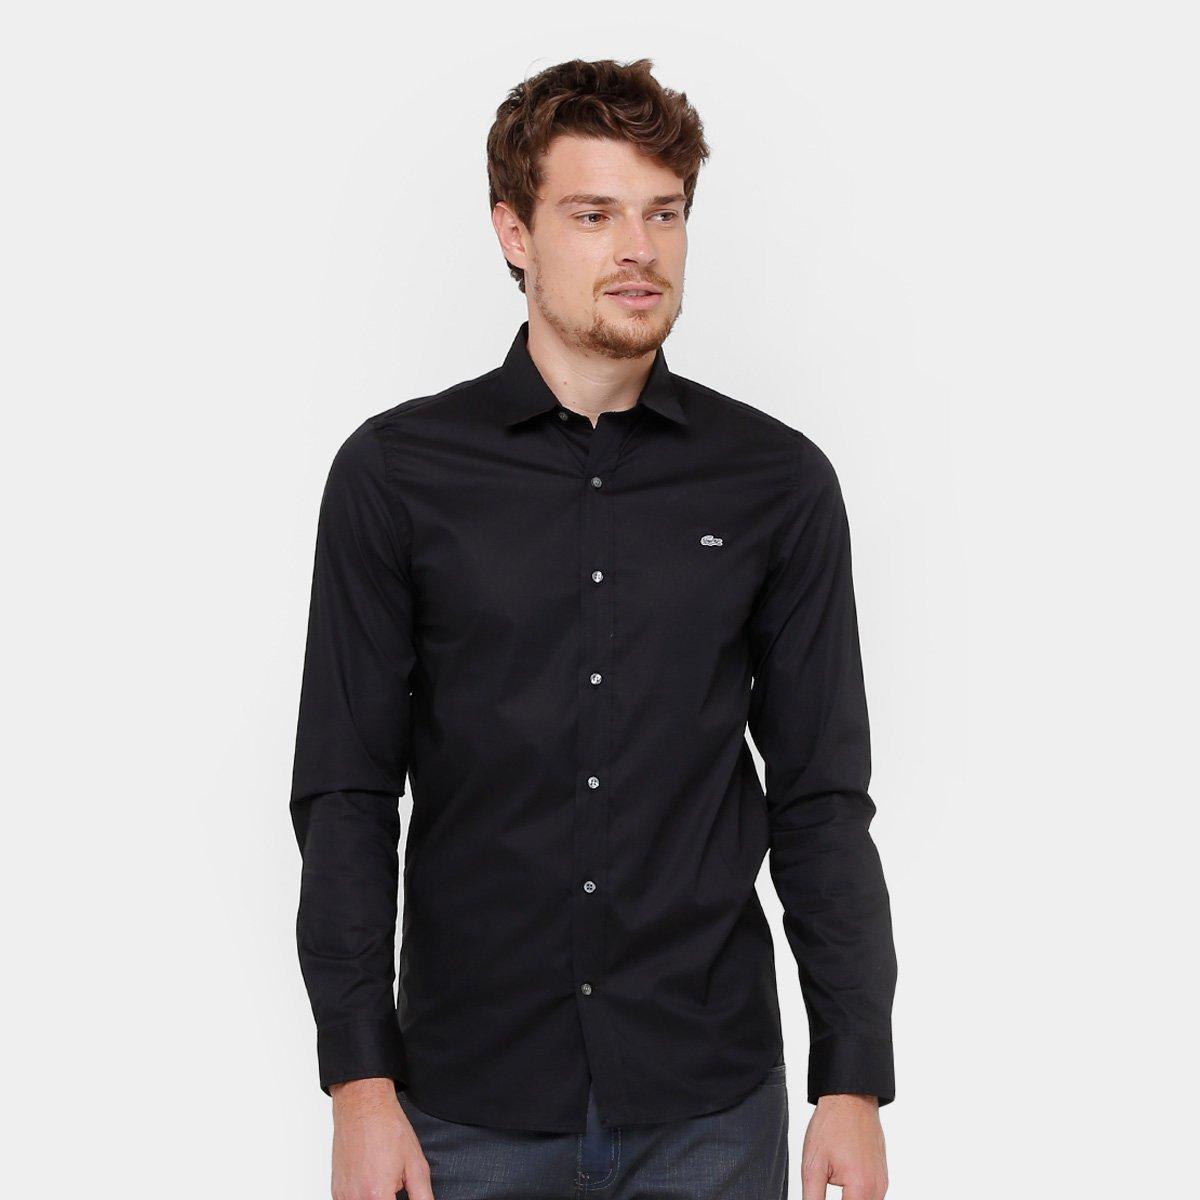 10ec344431f26 Camisa Social Lacoste Slim Fit Lisa Masculina - Compre Agora   Zattini